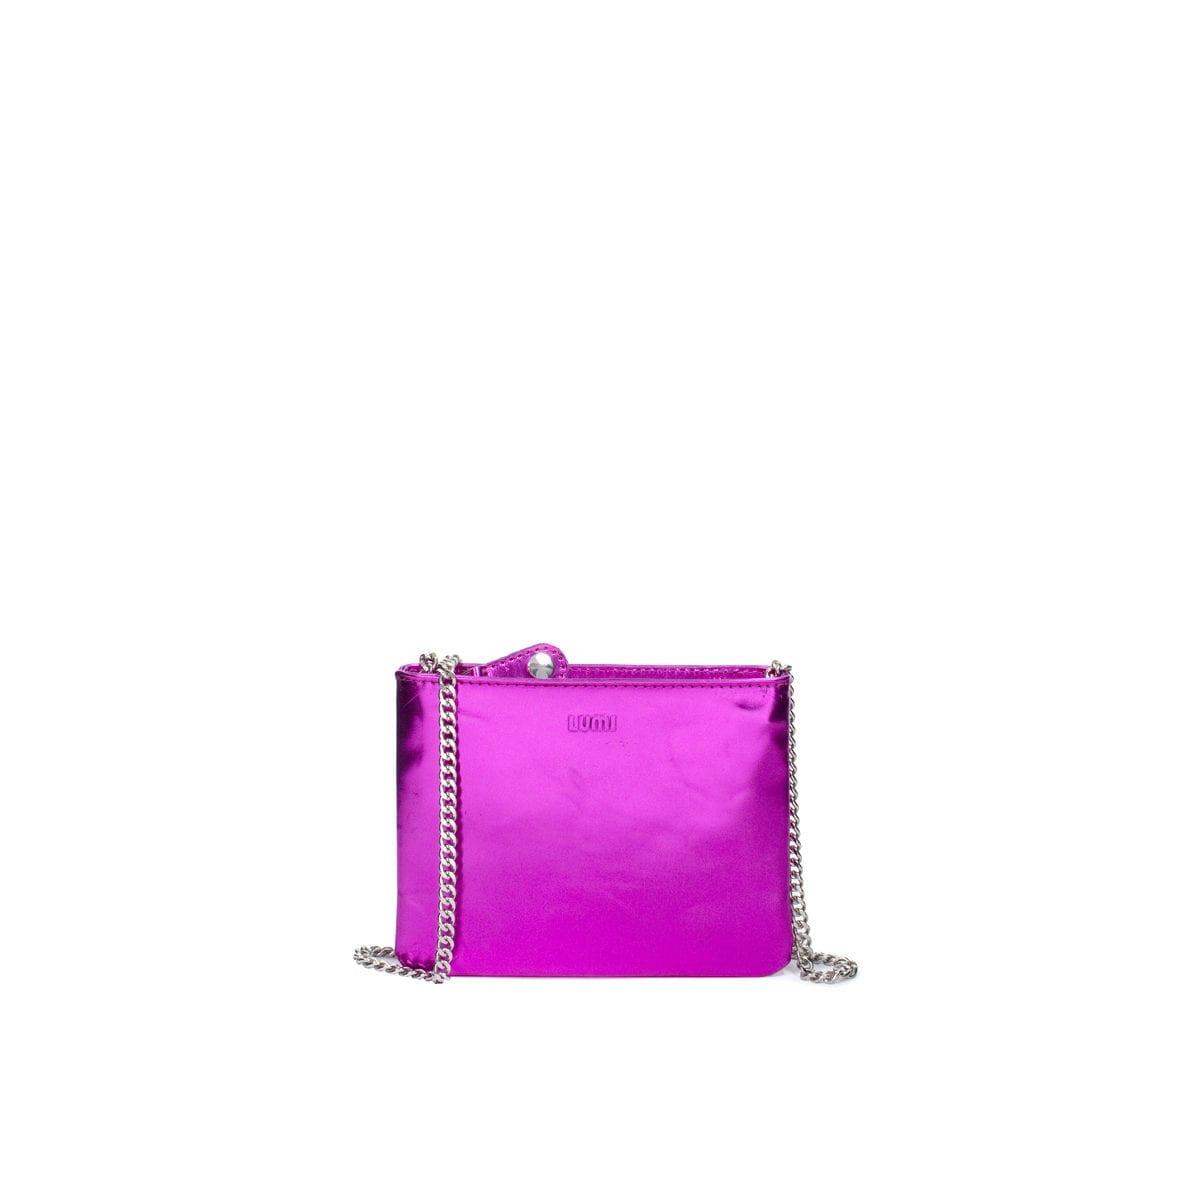 9a66159109 Laura Envelope Clutch Metallic Red-Violet